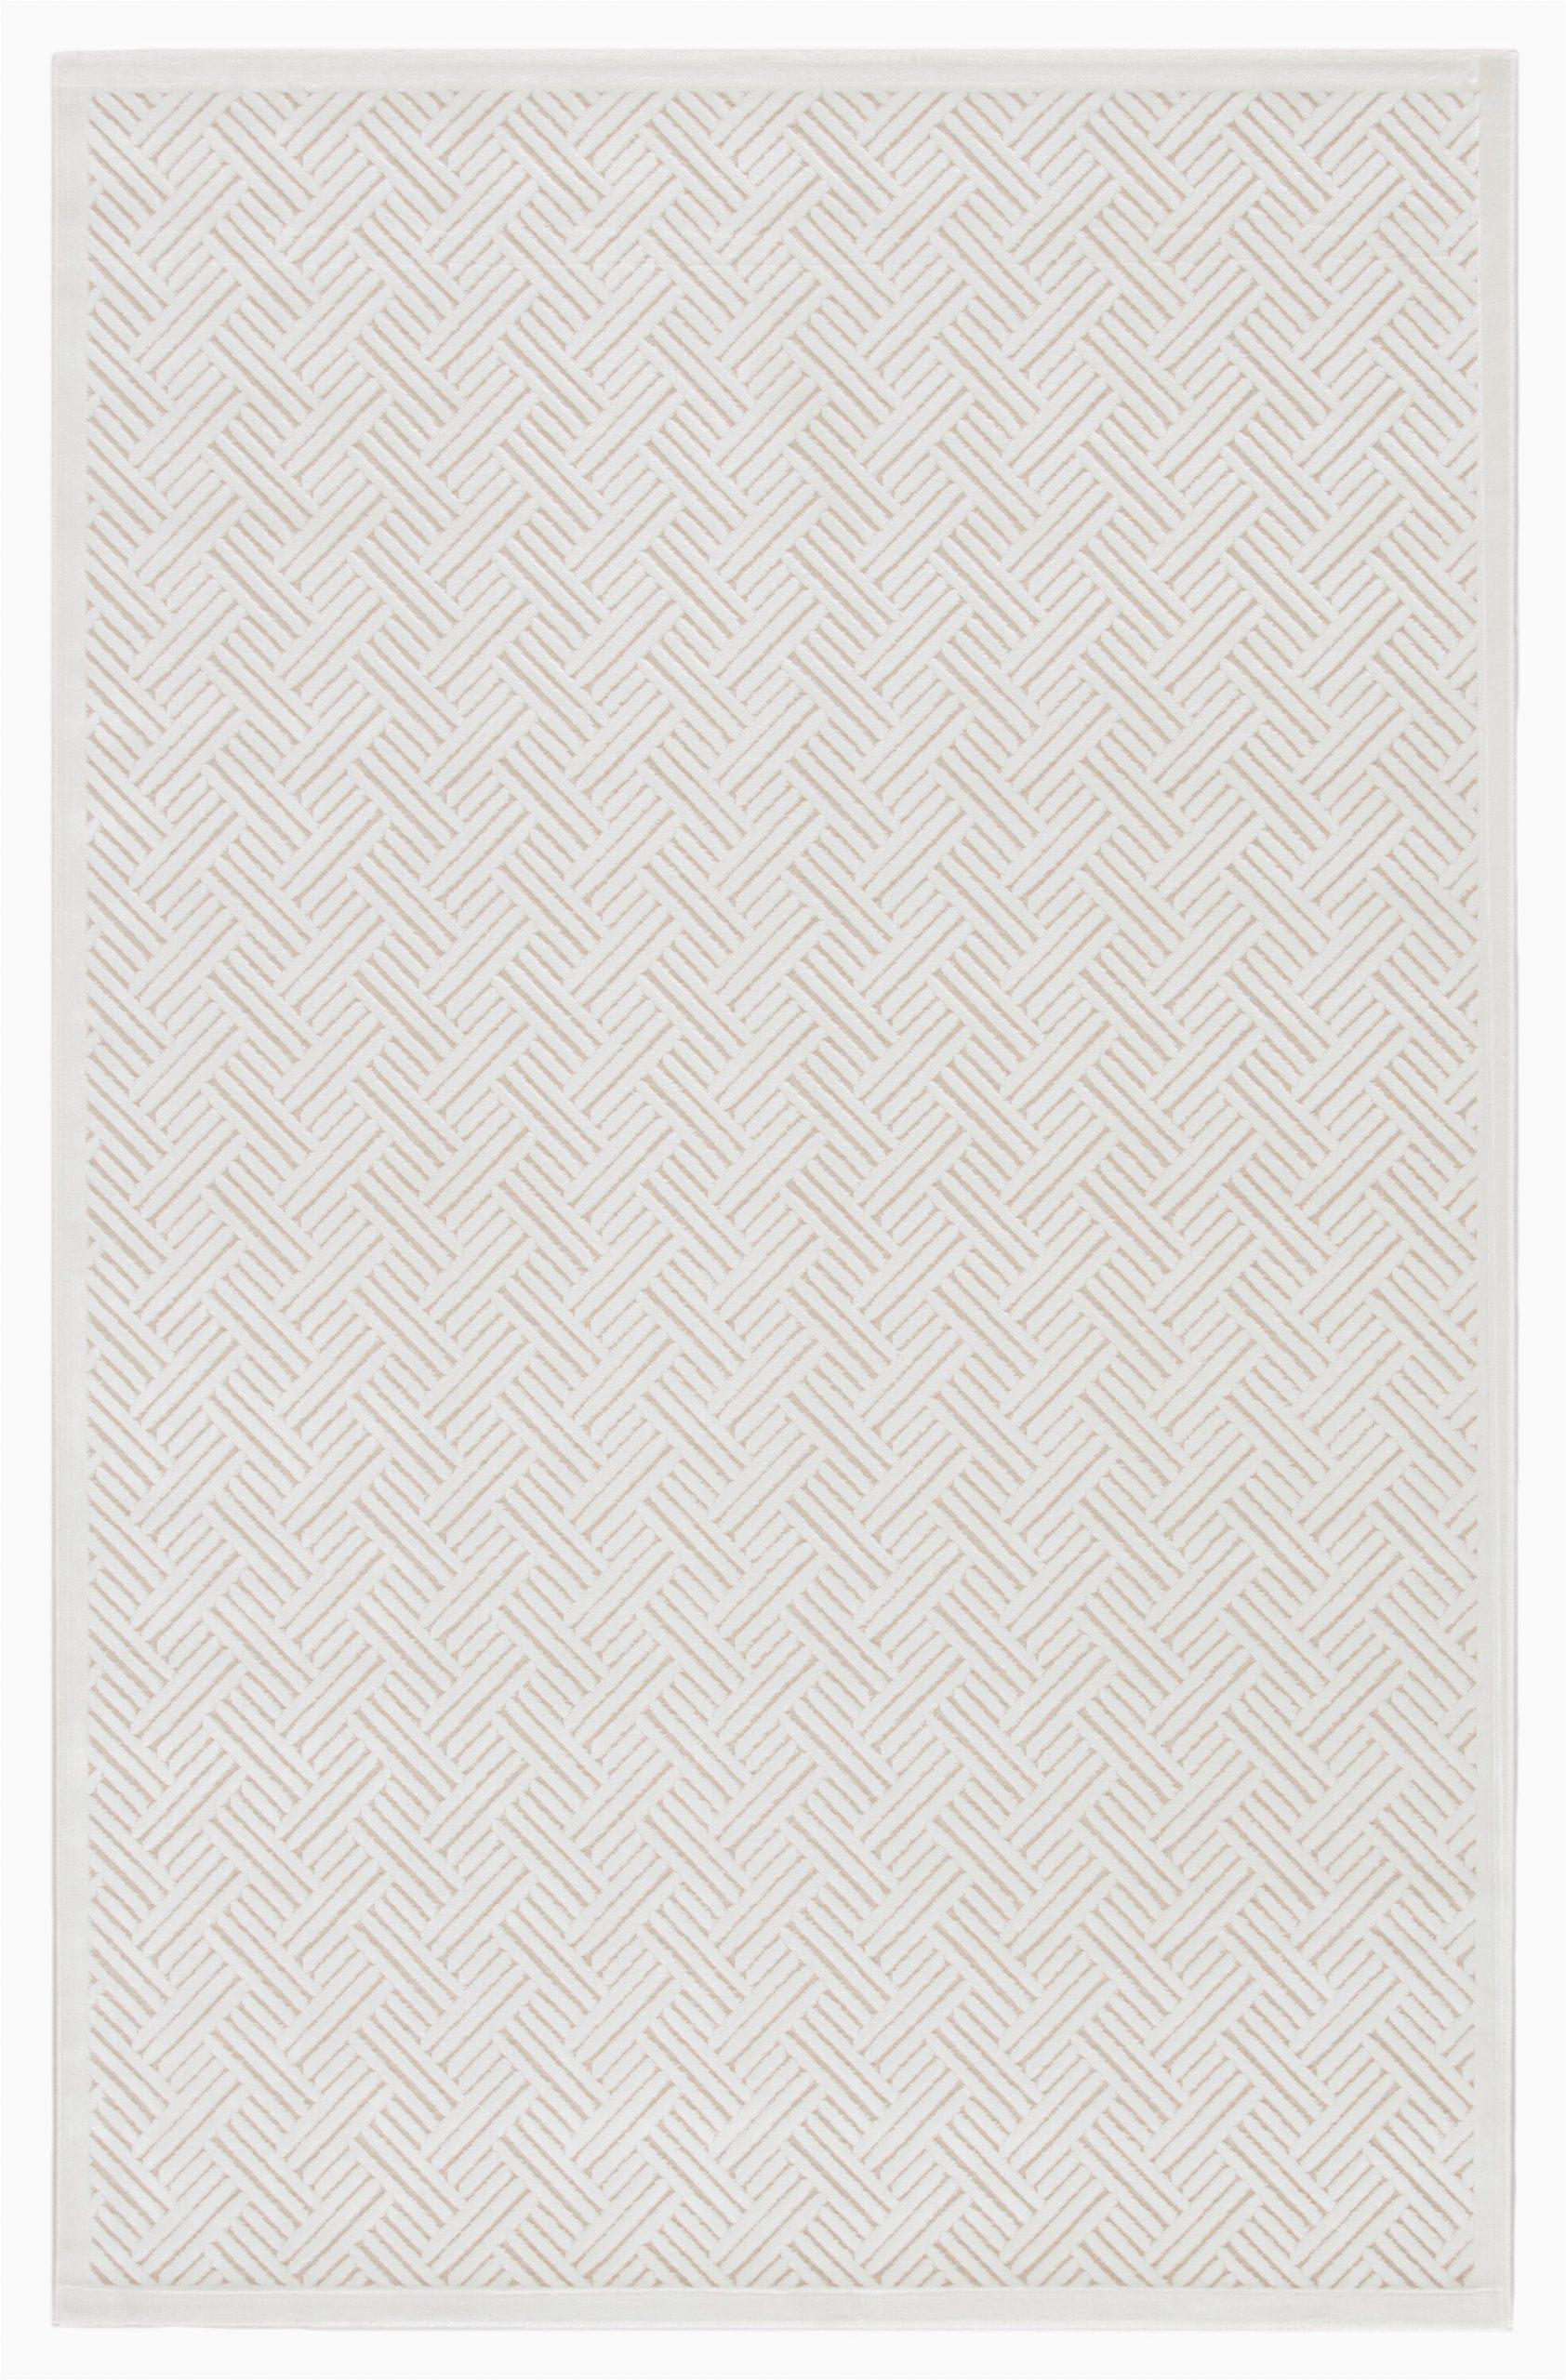 killebrew herringbone bright white white sand area rug